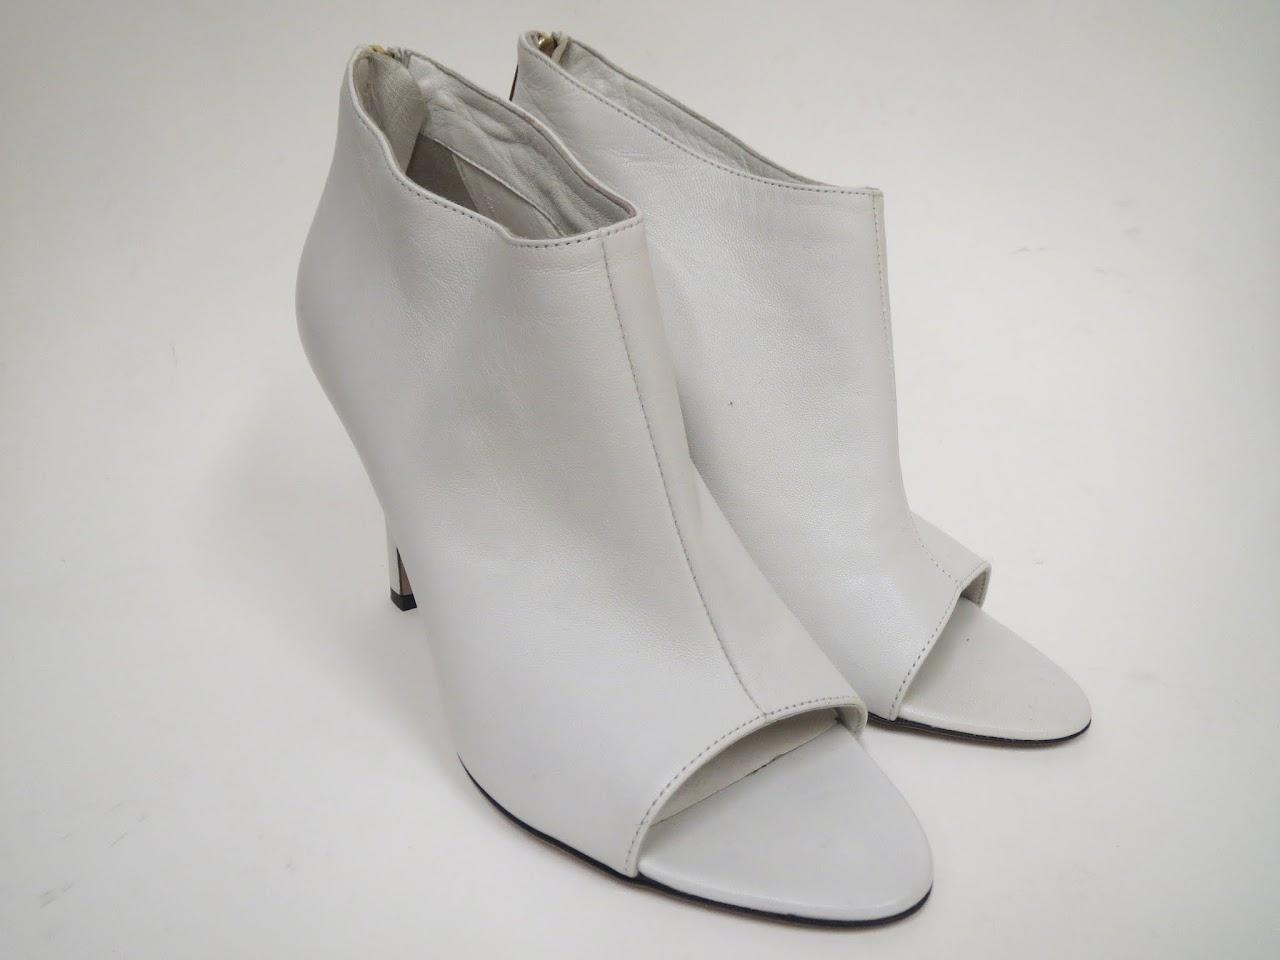 Tamara Mellon White Peeptoe Boots